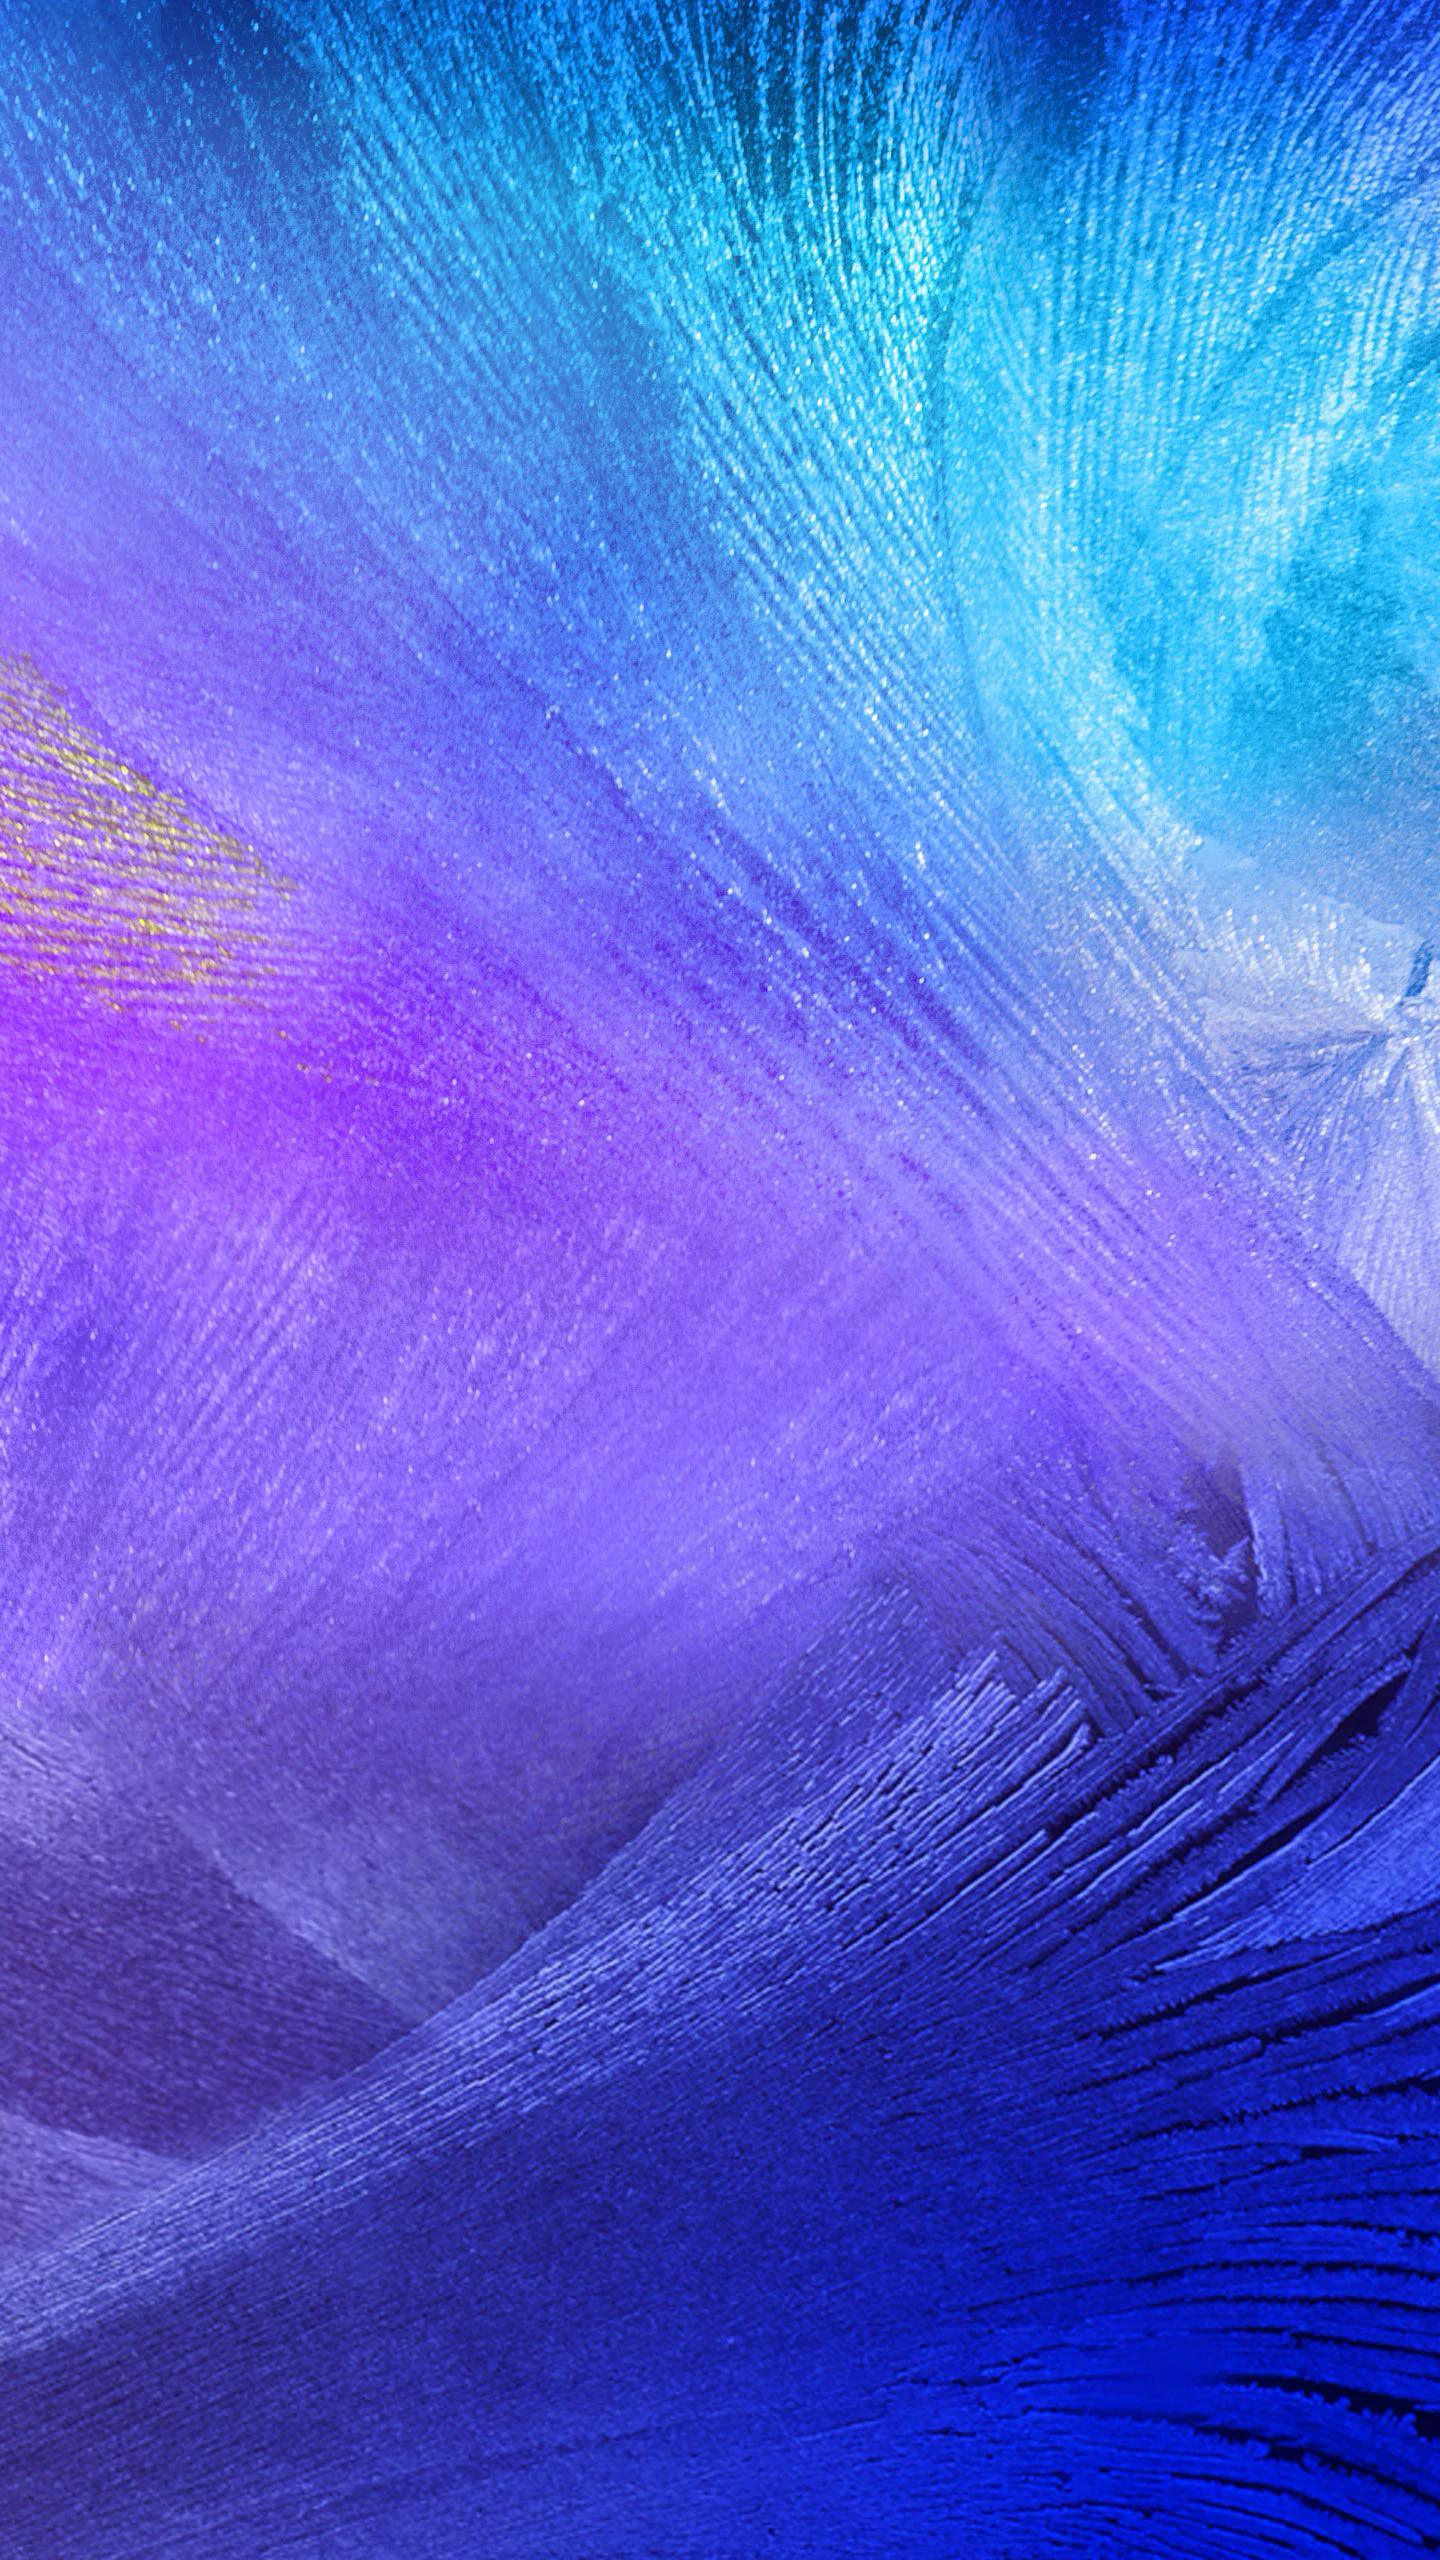 Galaxy note 4 official wallpaper 11.jpg (1440×2560)